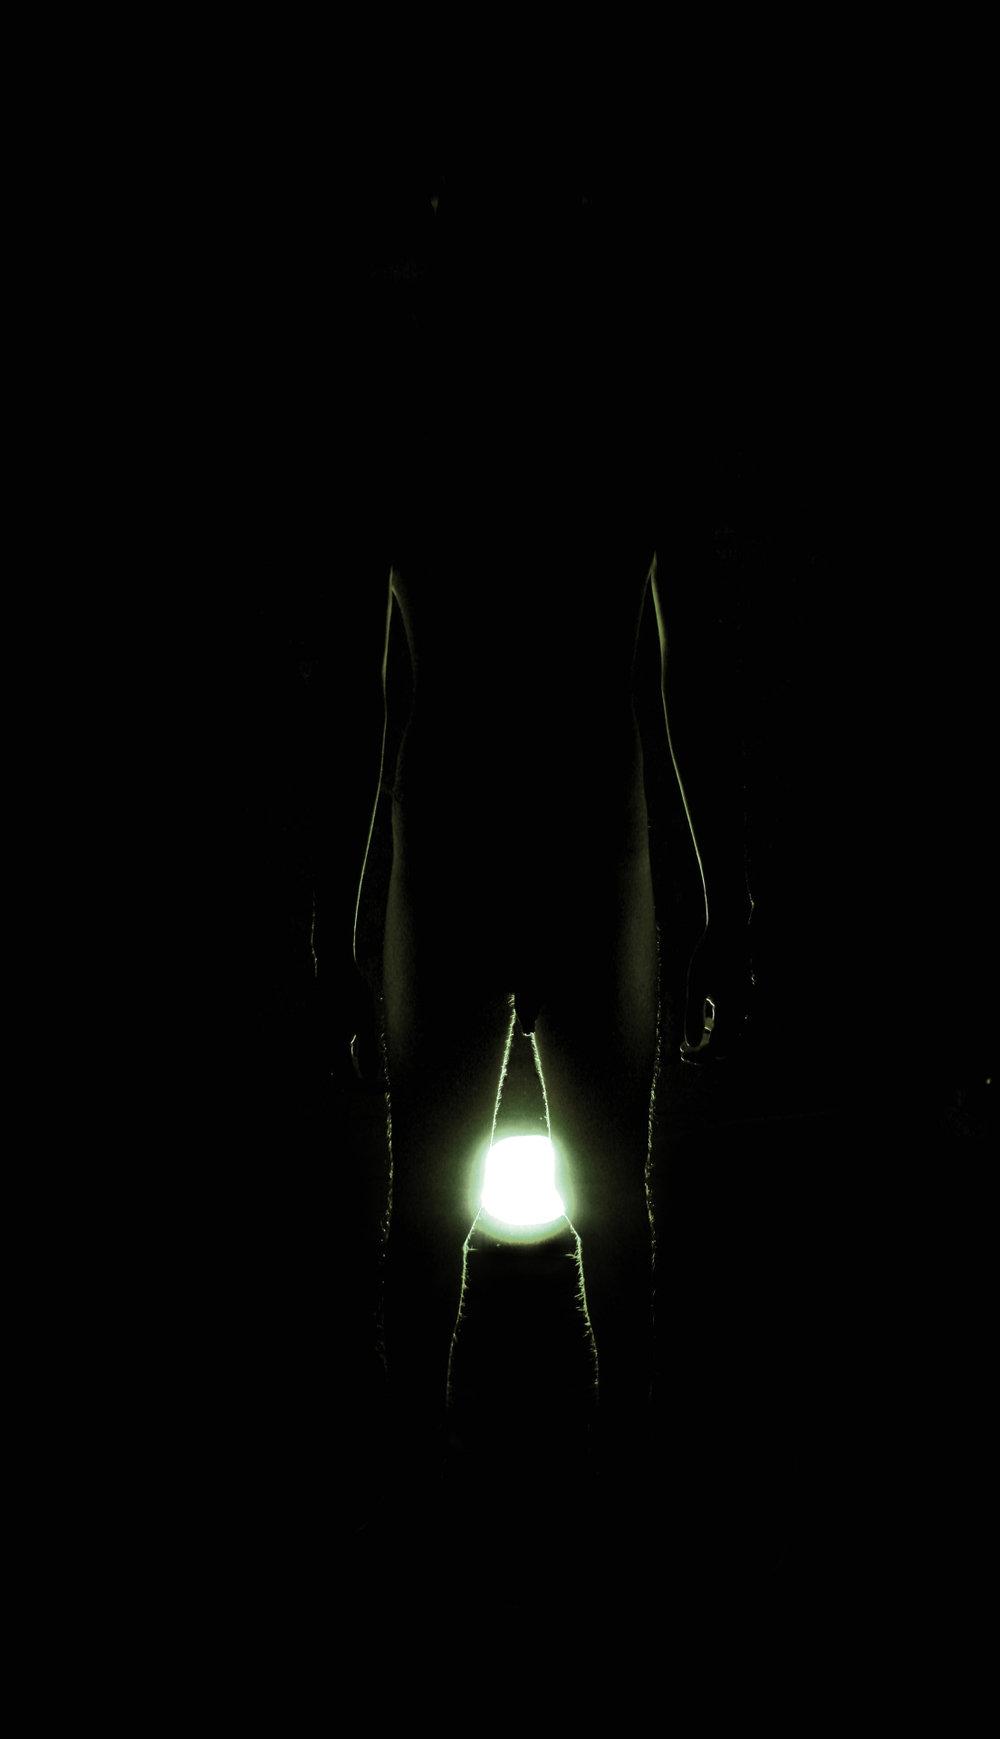 Johnny Abbate - Alien #11 - 2012